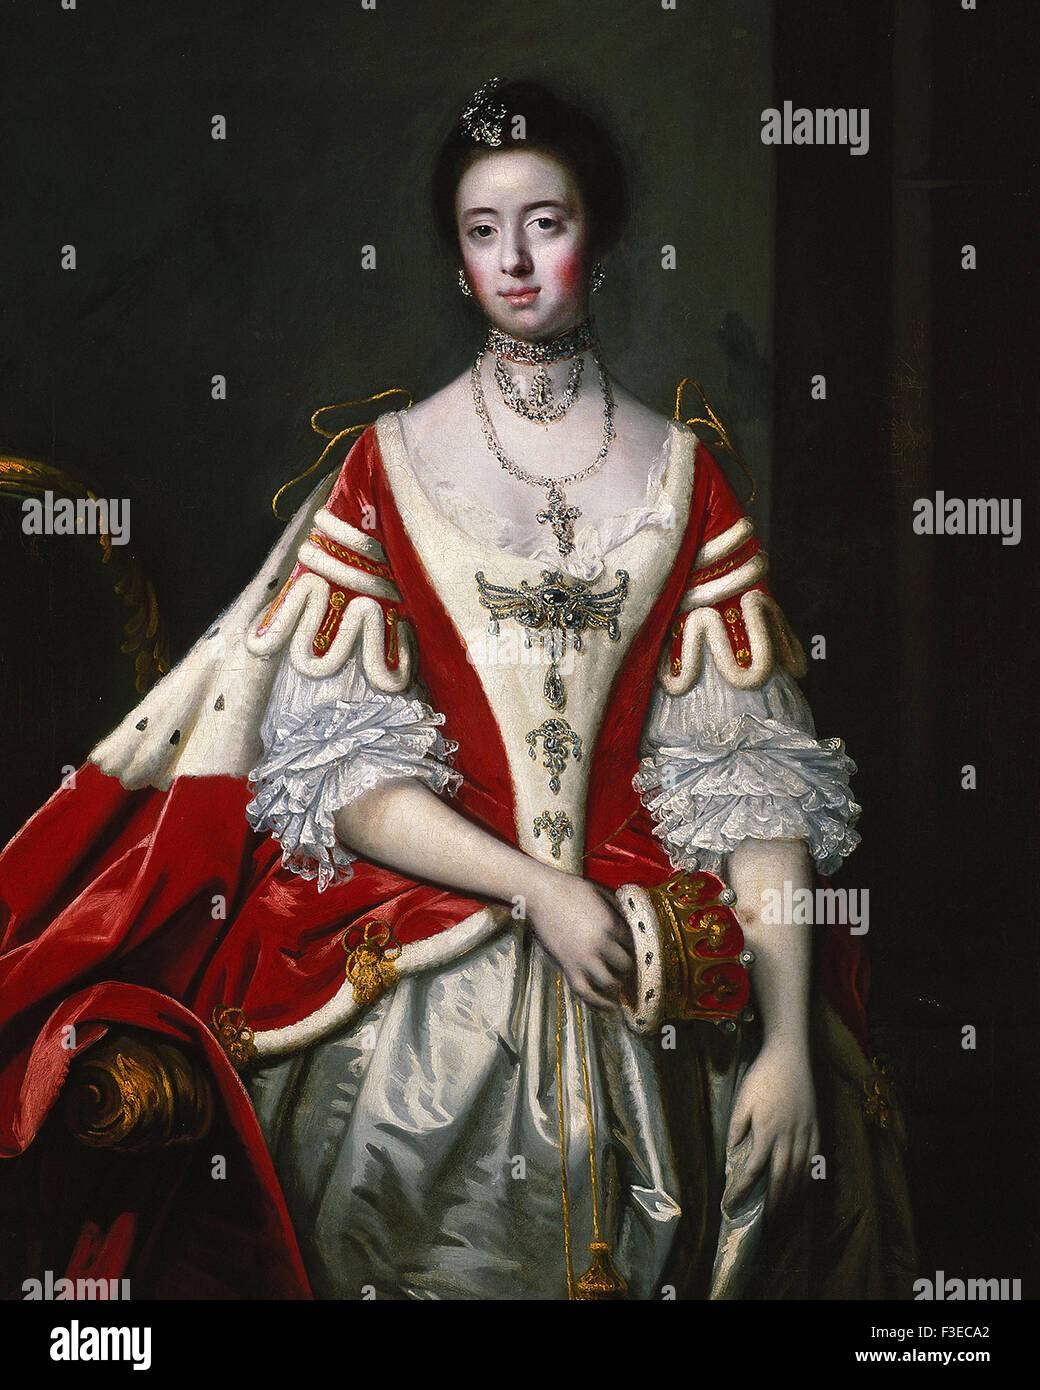 Sir Joshua Reynolds - Frances, Countess of Dartmouth - Stock Image